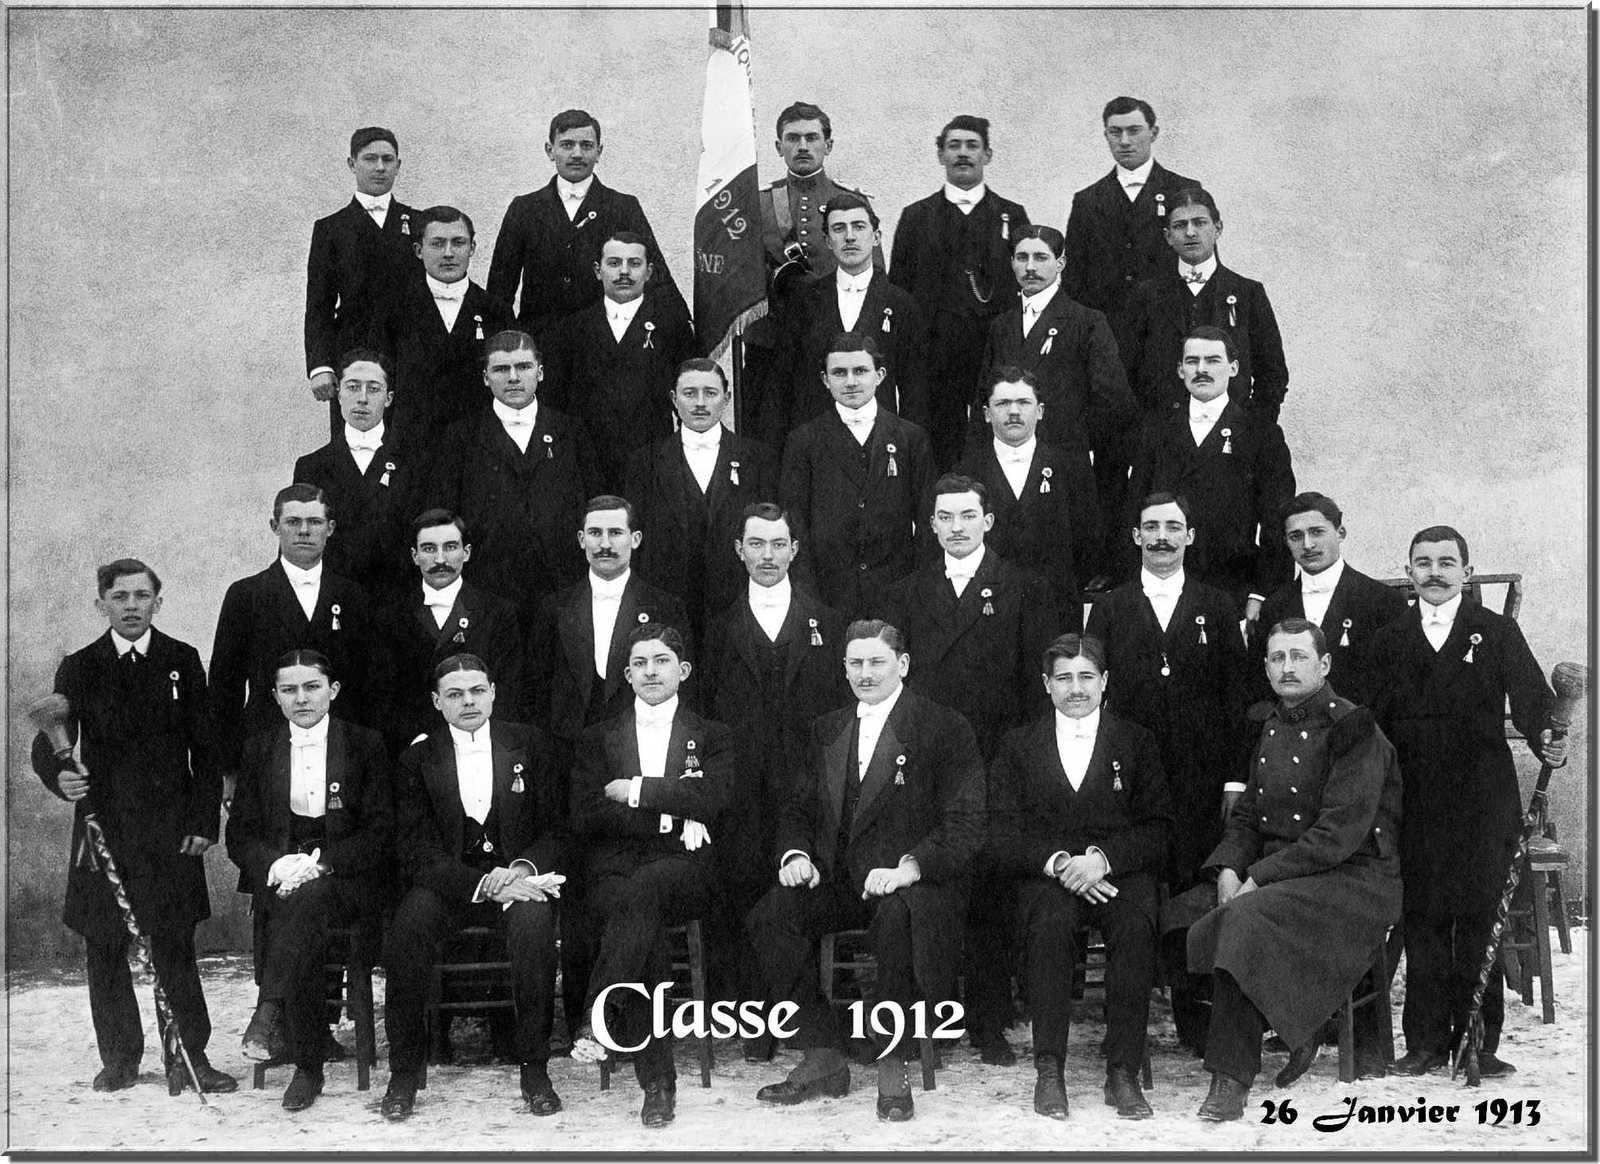 0 - album les 20 ans des classes en &quot&#x3B;2&quot&#x3B;